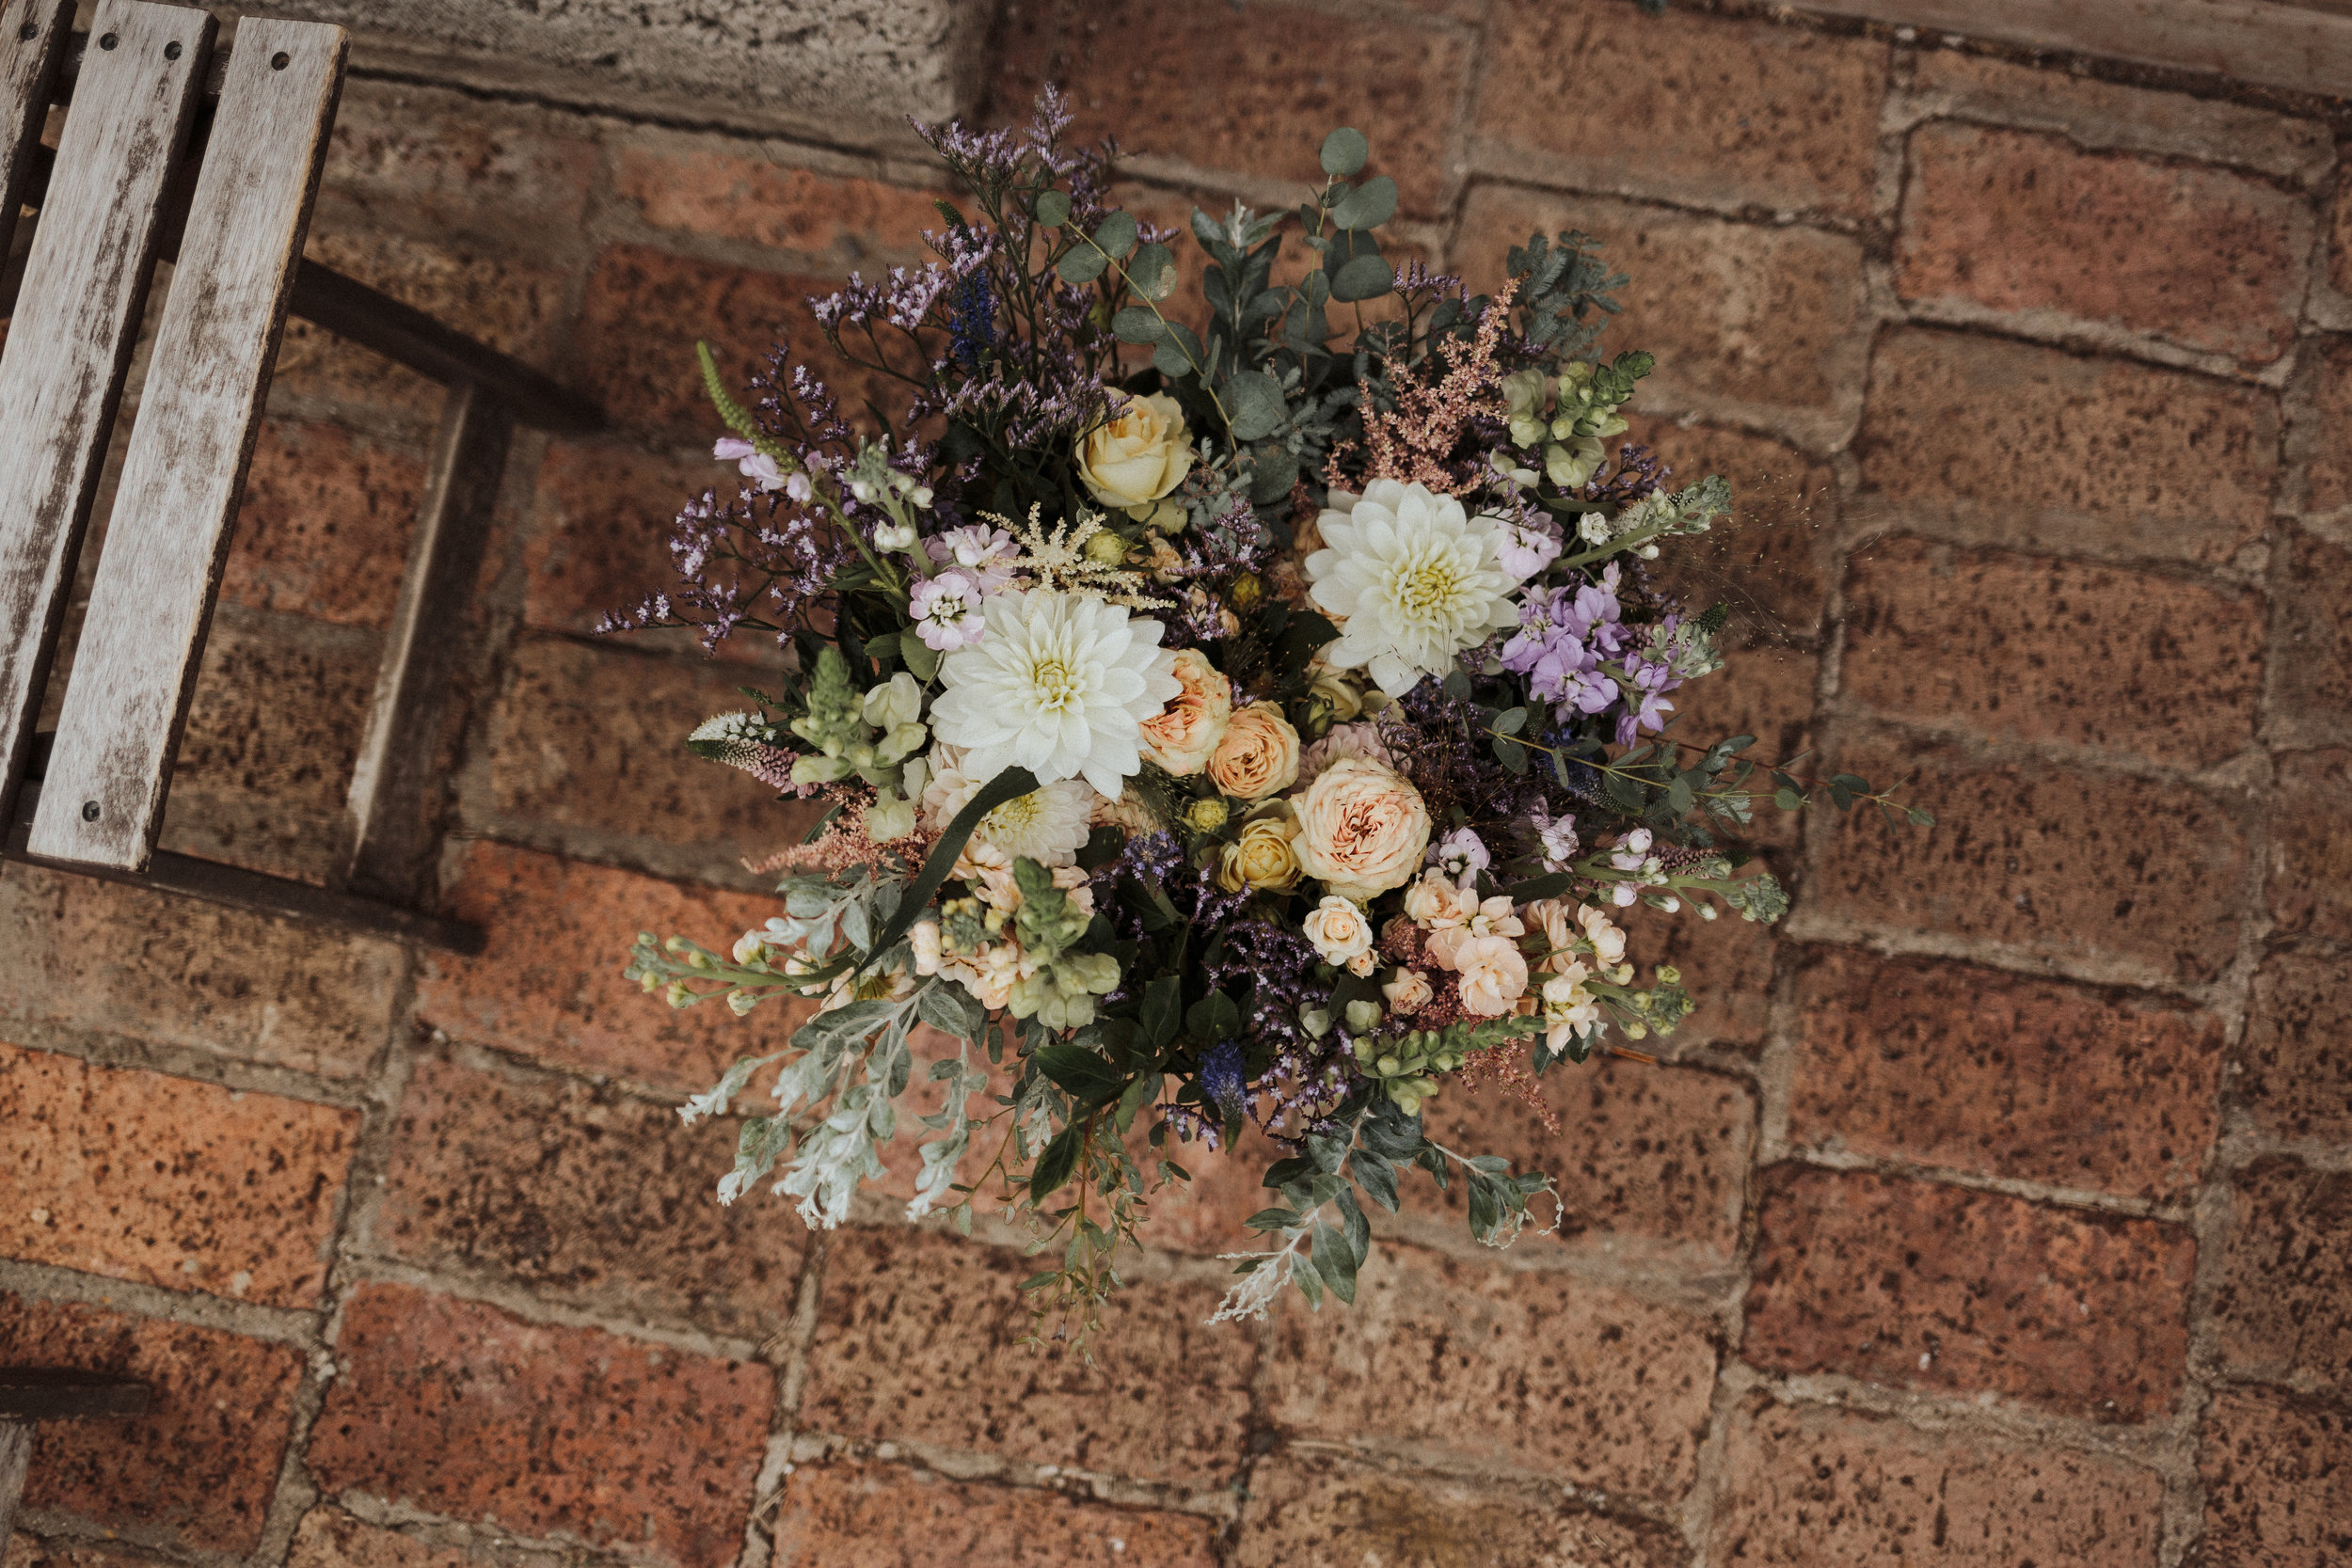 20170902_Monika+Marci_wedding_f_096__MG_5599_1.jpg